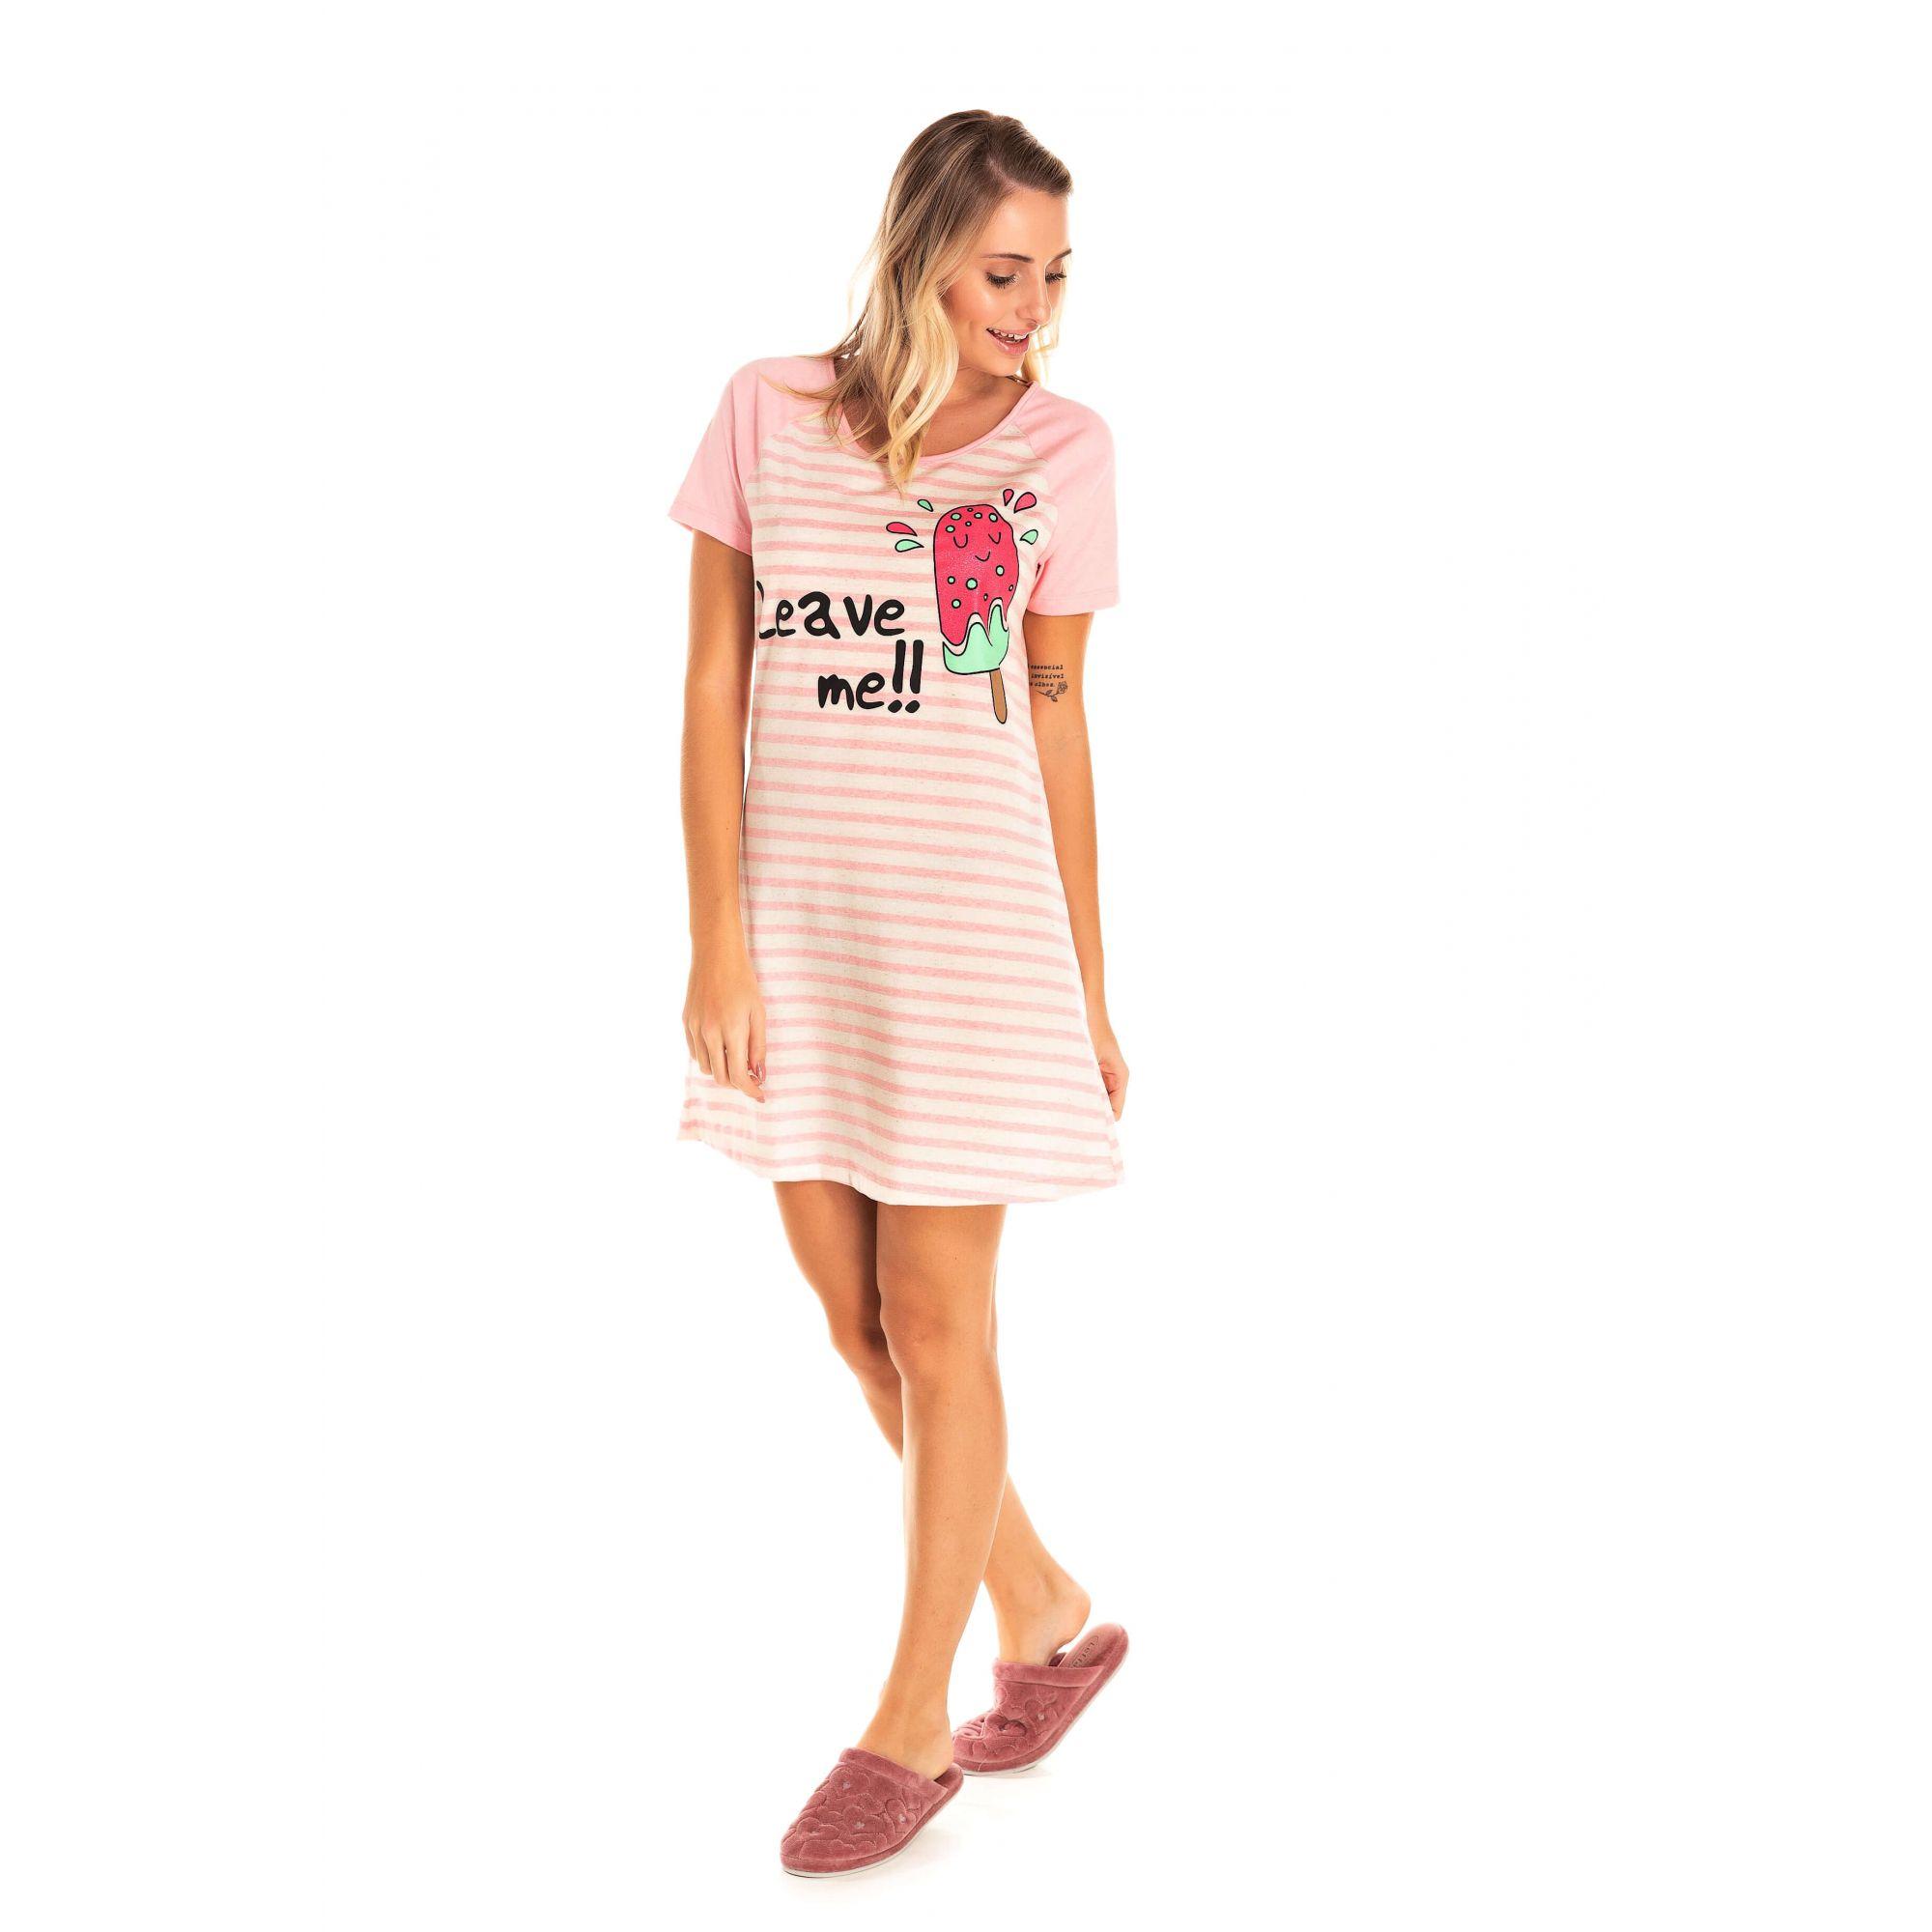 Camisola Adulto Feminino Picolé - Rosa